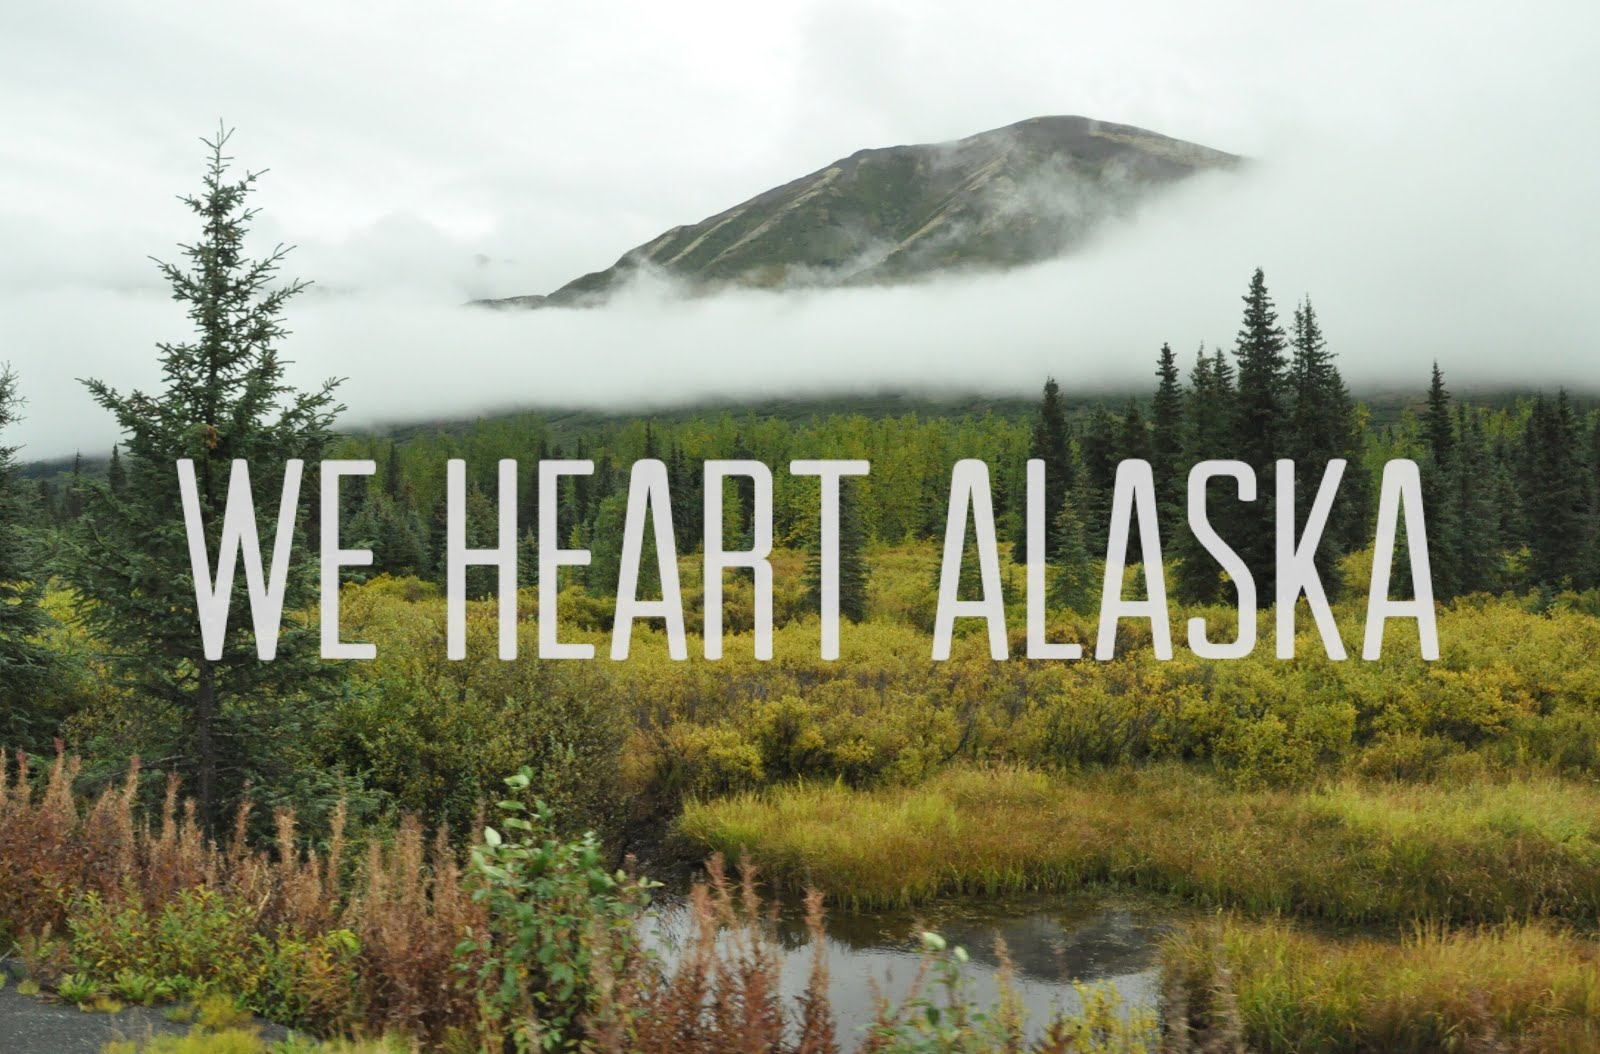 We Heart Alaska